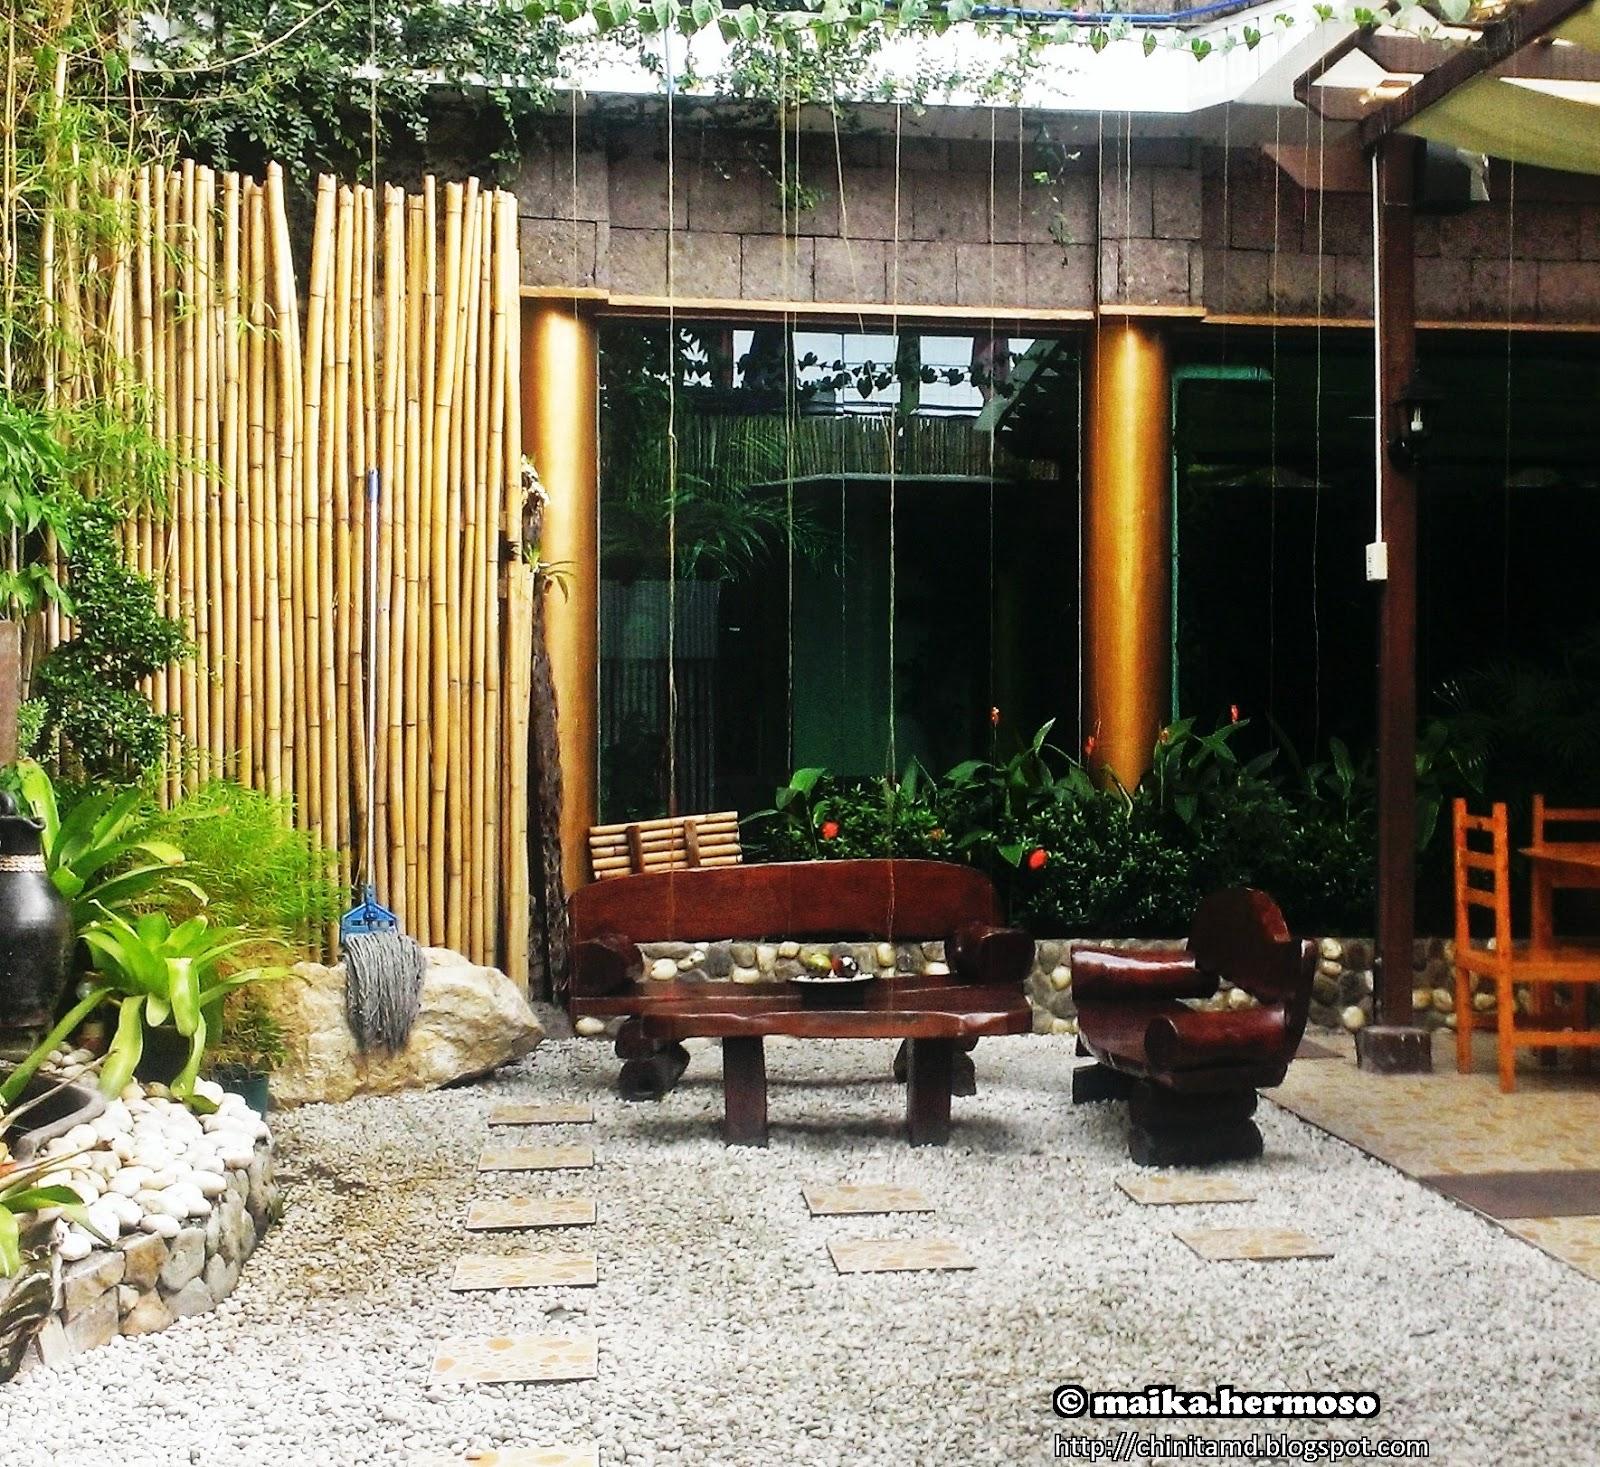 Jardin Cafe Jalan Cimanuk: Cozy Cafe And Party Place In Pasay: Patio Jardin Cafe